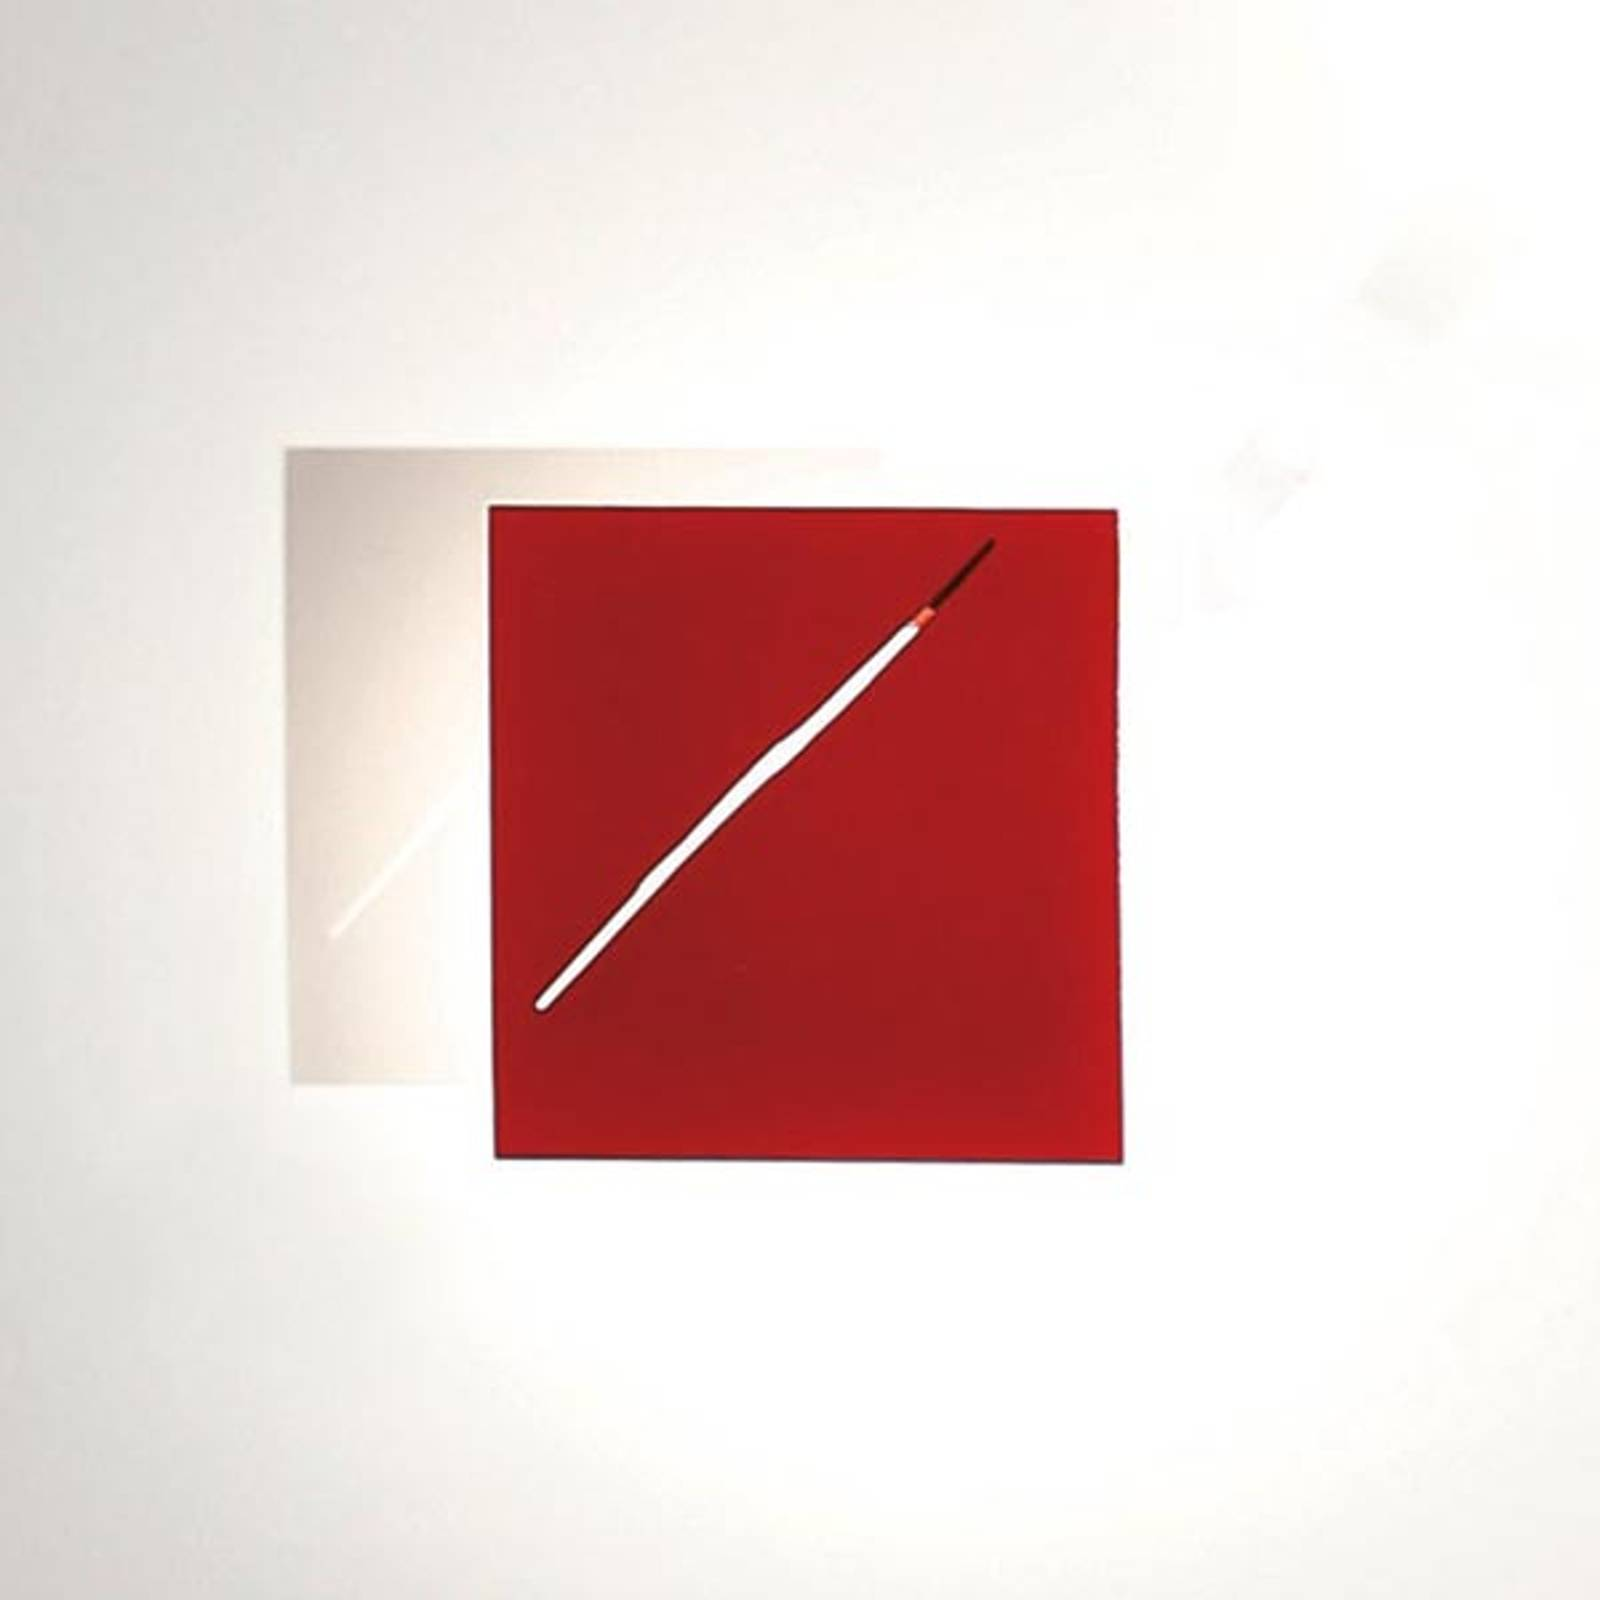 Knikerboker Des.agn - LED-Wandleuchte, rot